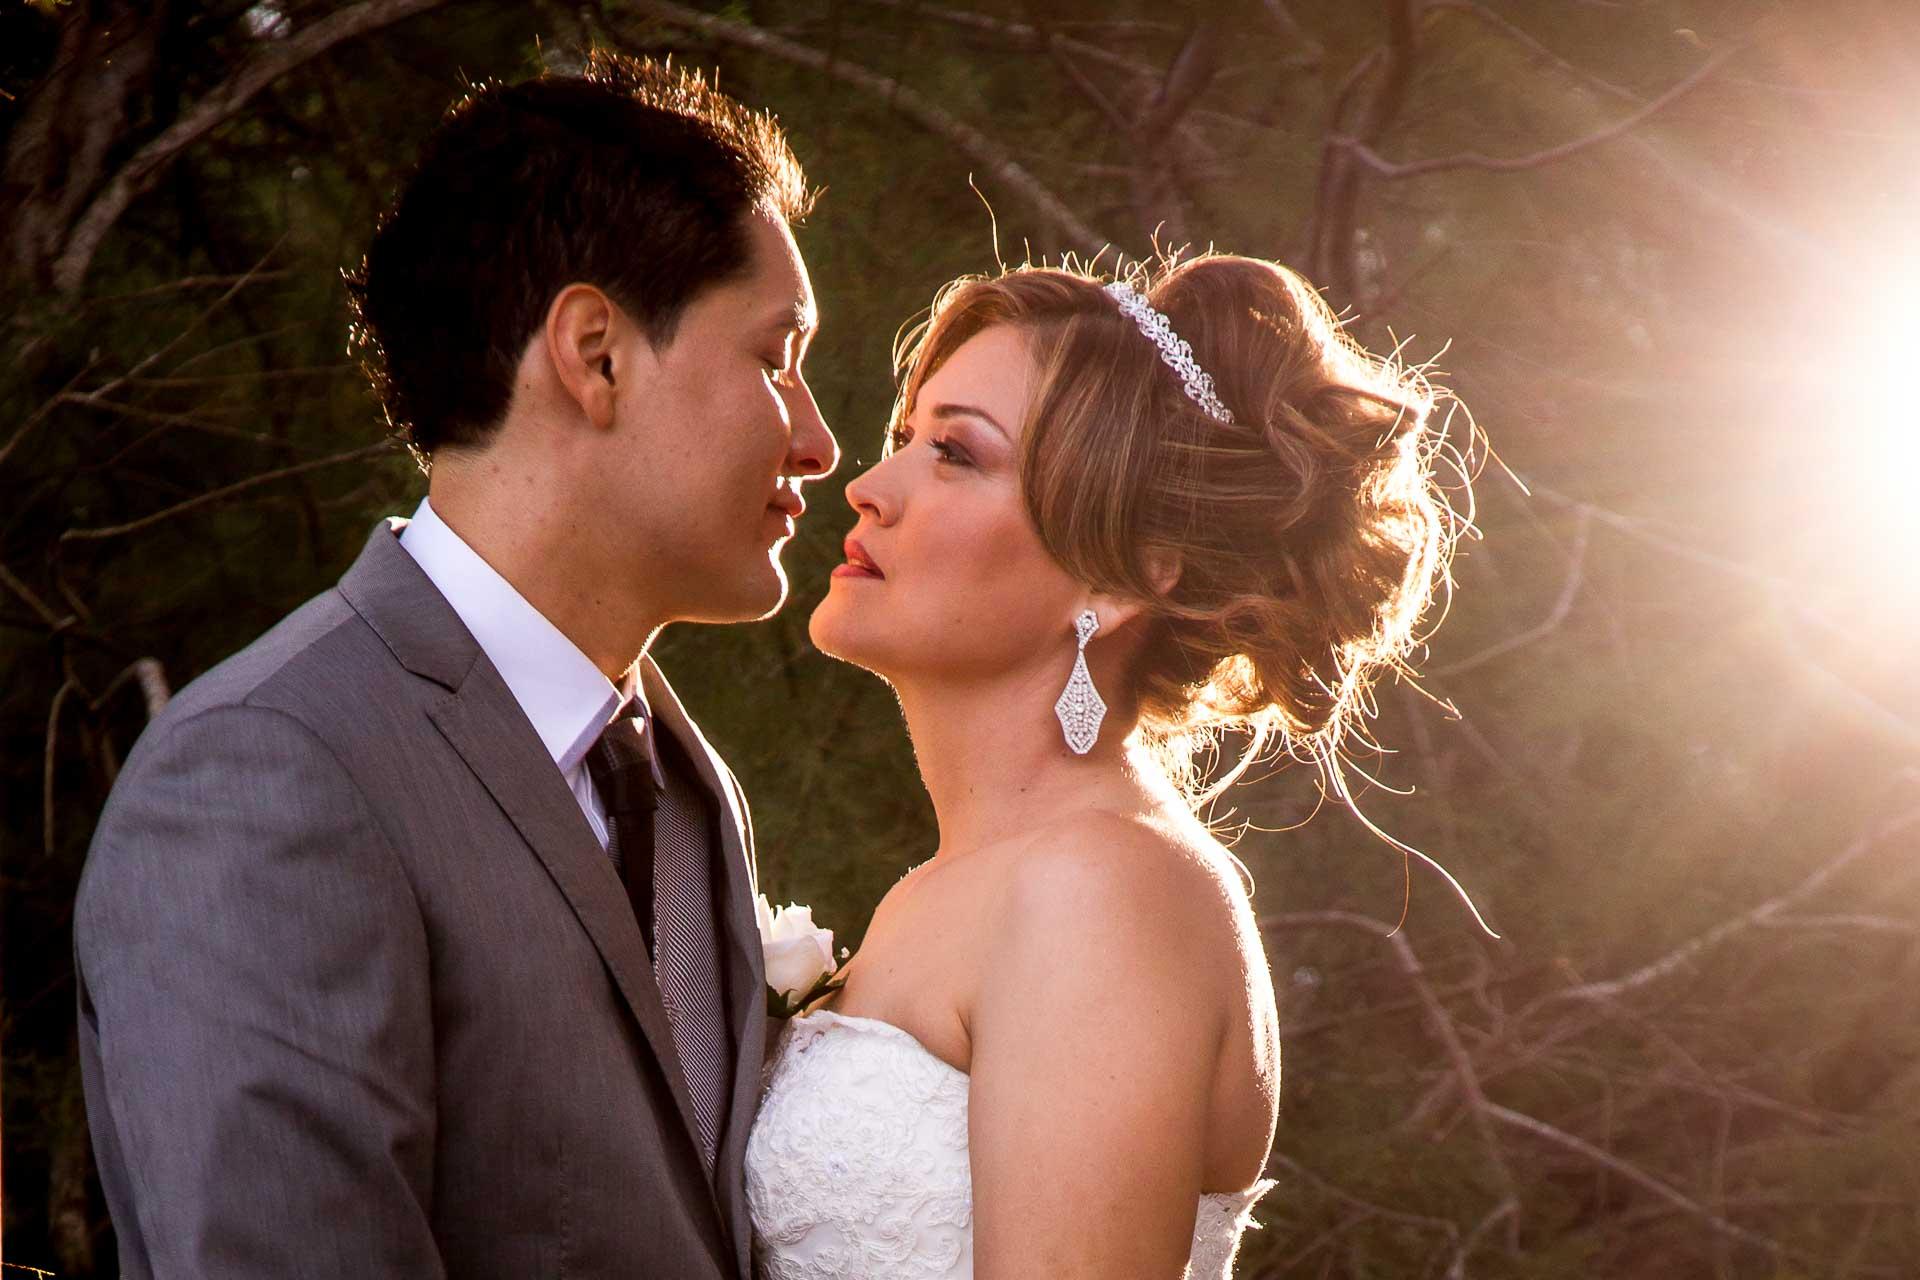 fotógrafo de boda en Valencia. Foto de boda en la playa